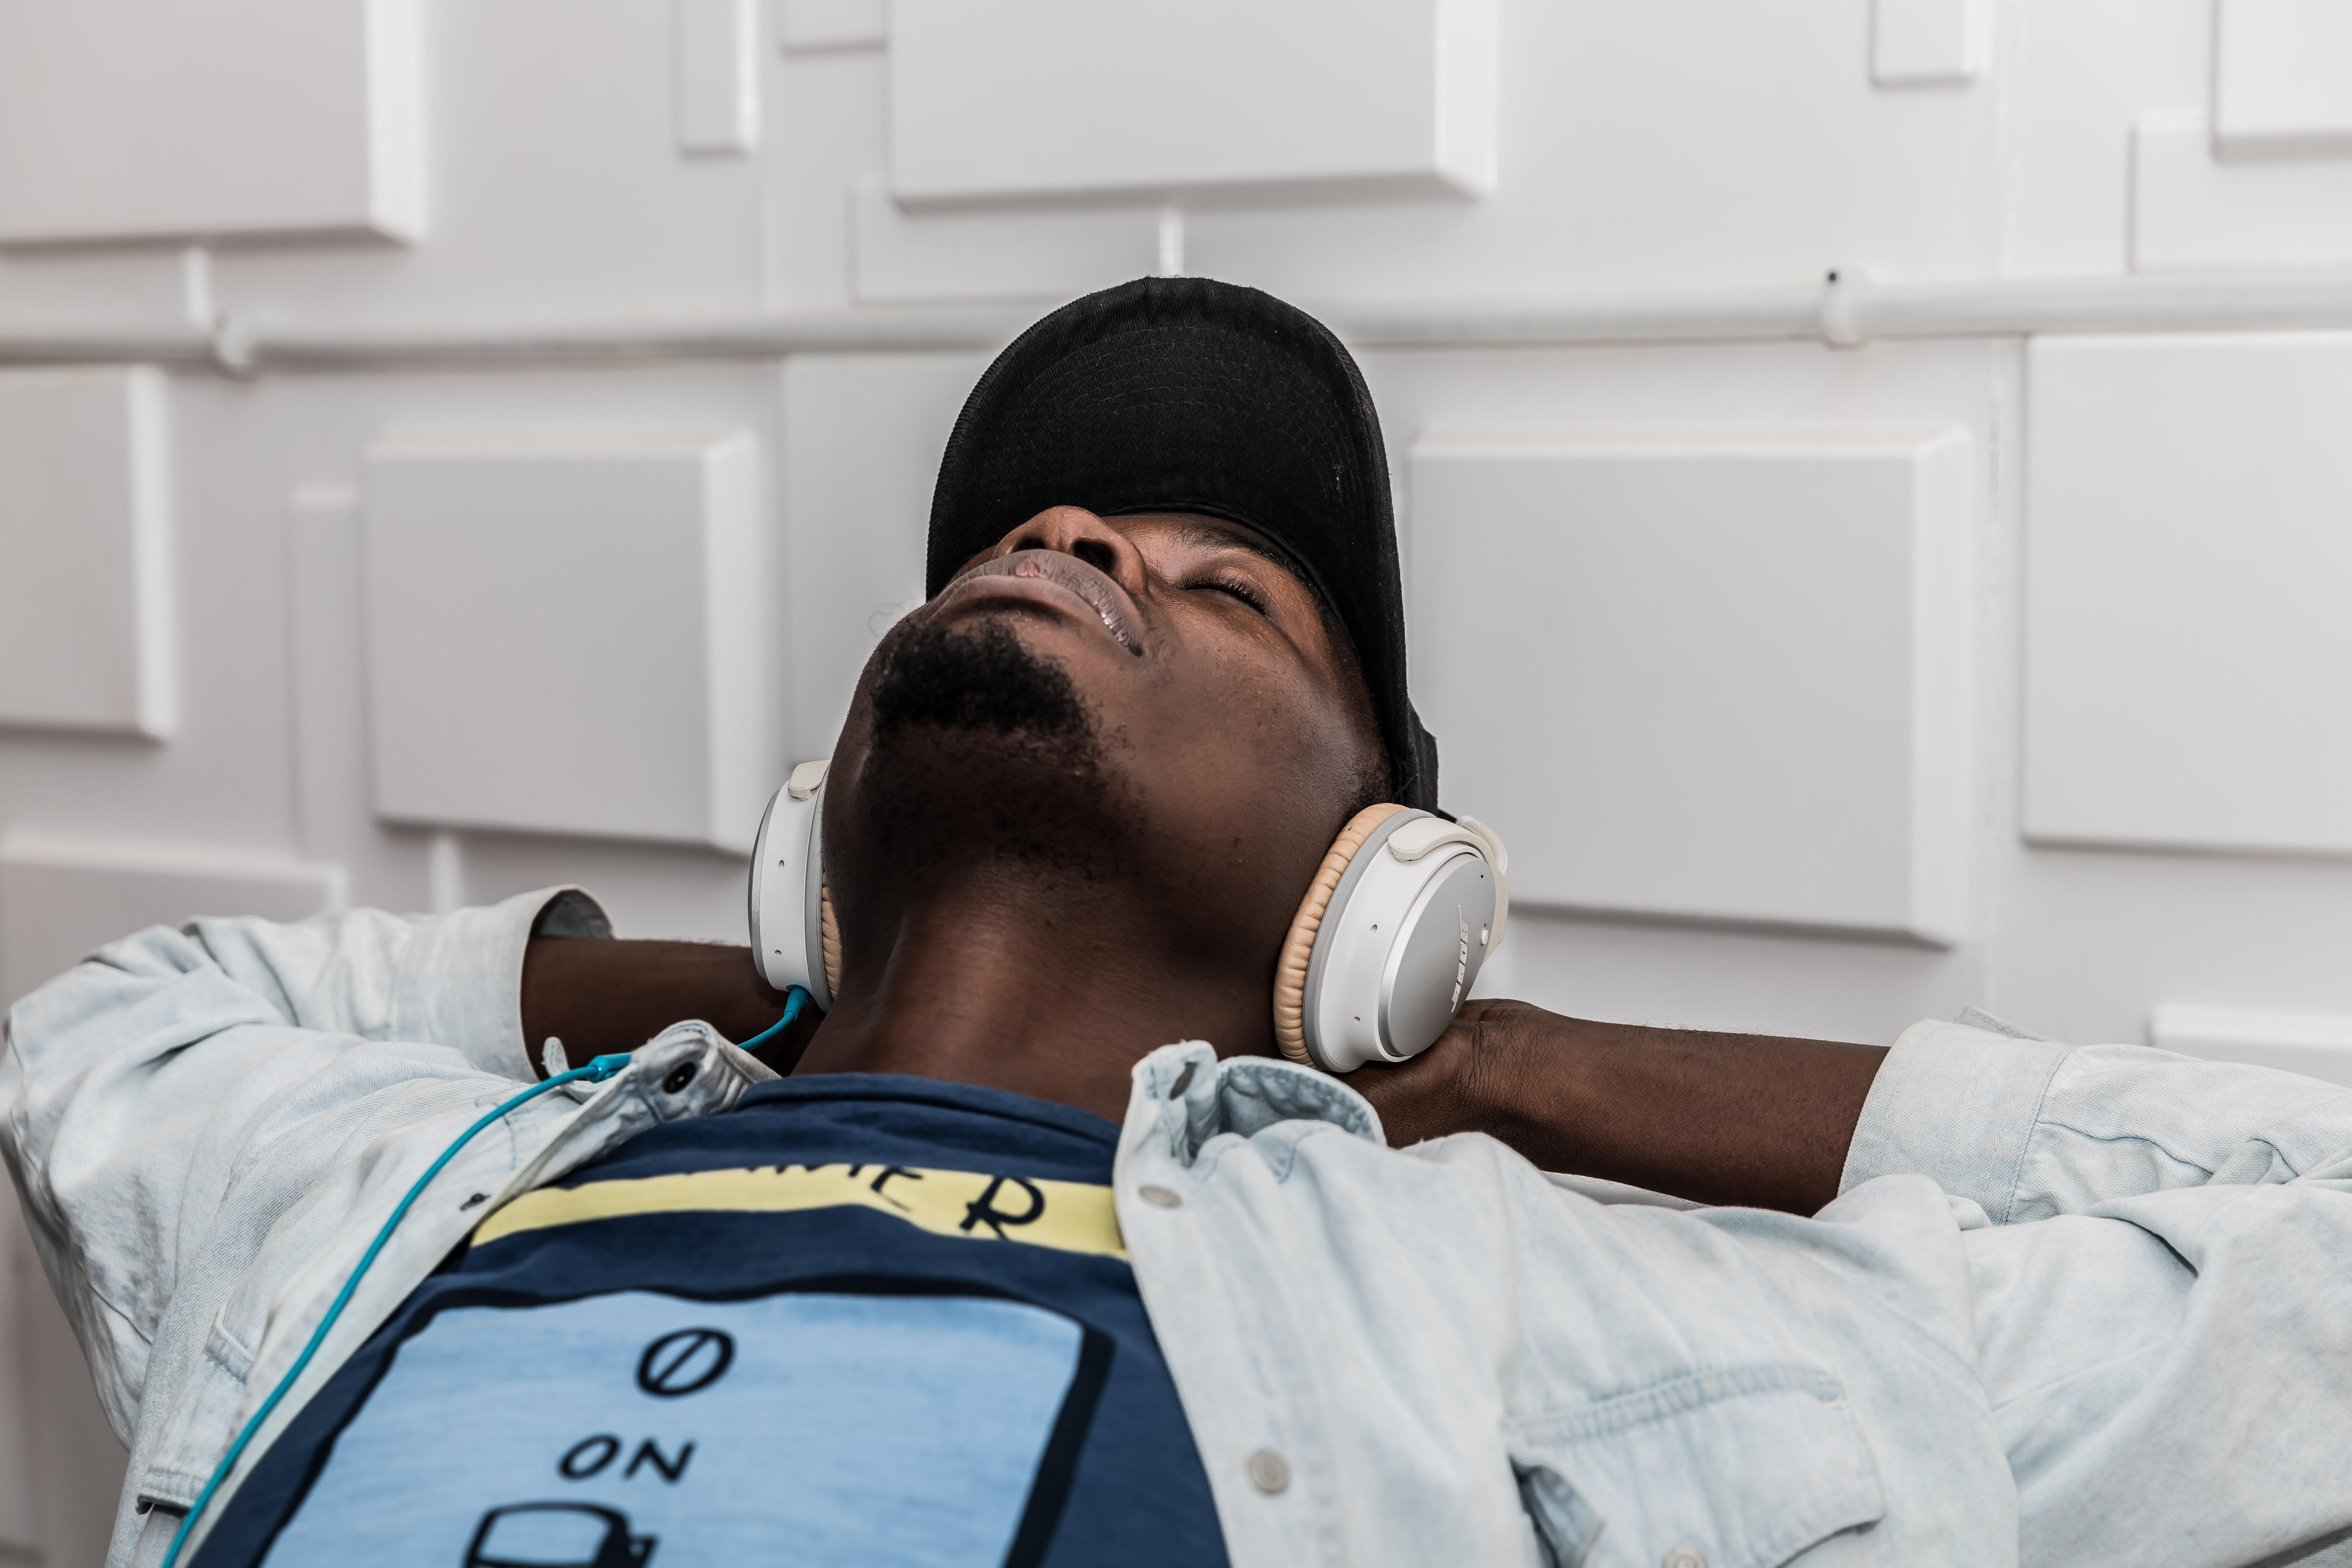 man wearing denim jacket wearing headphones and listening to music